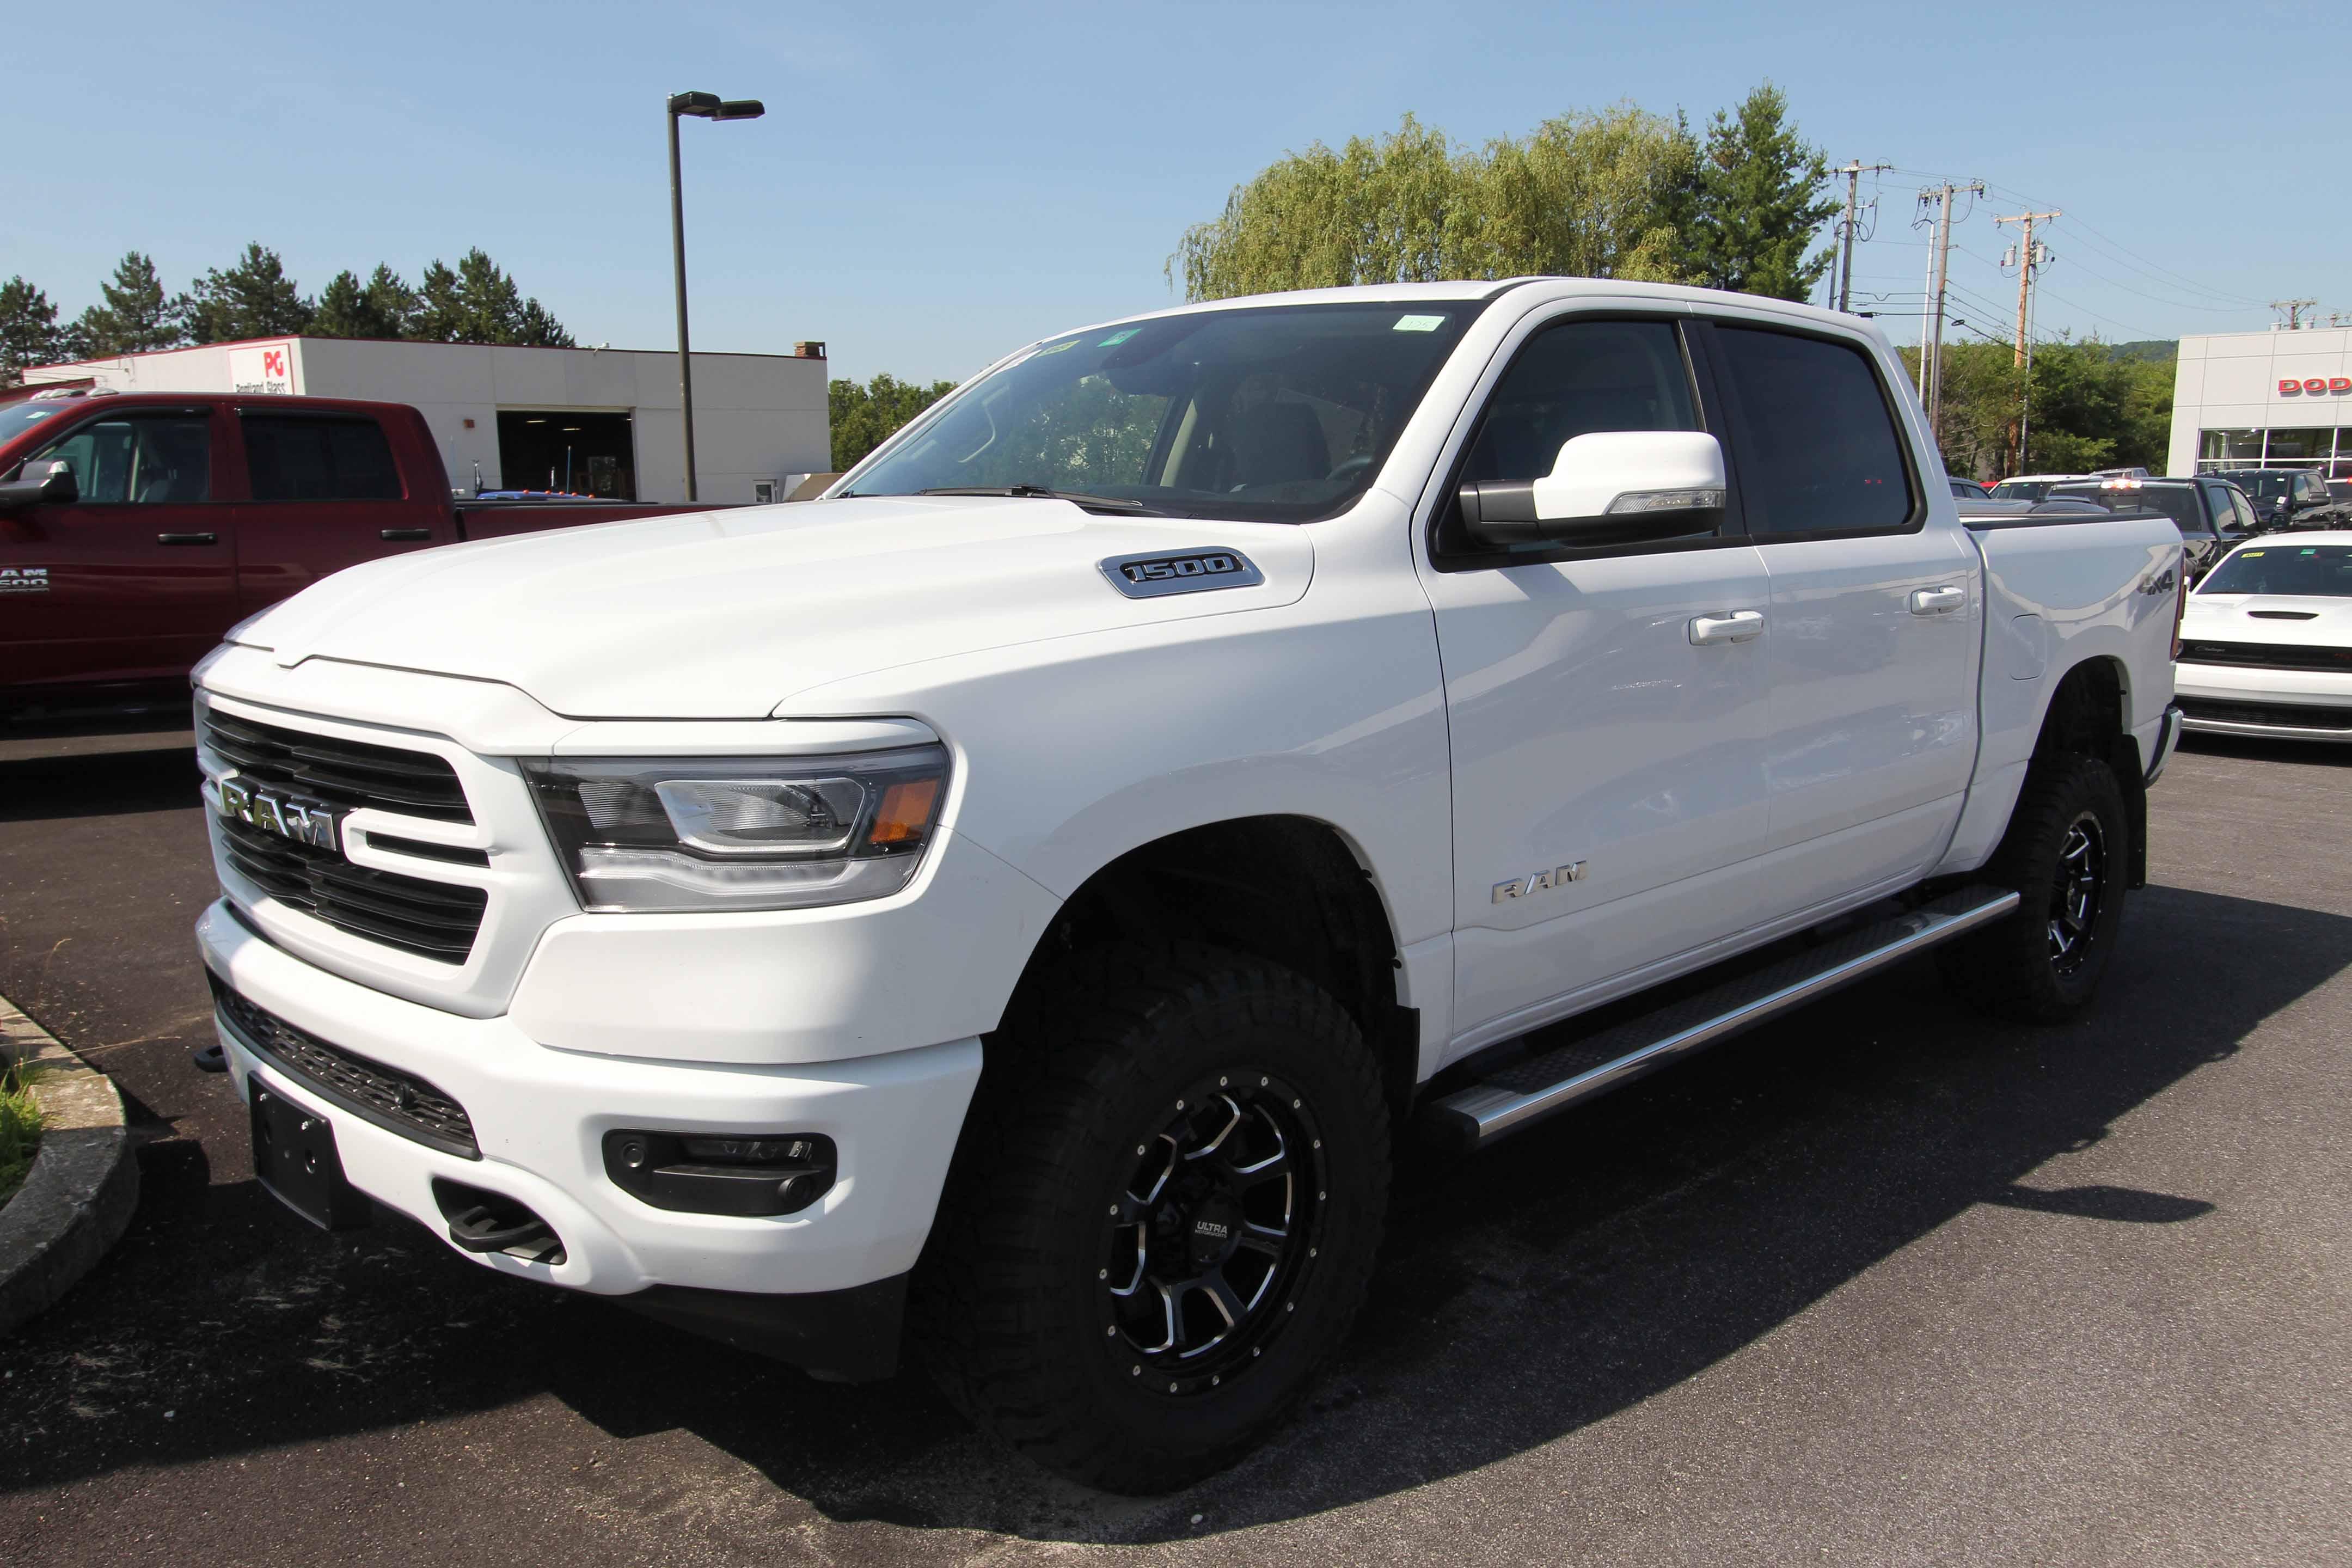 Custom Lift Vehicles | Cars and Trucks for Sale in Rutland